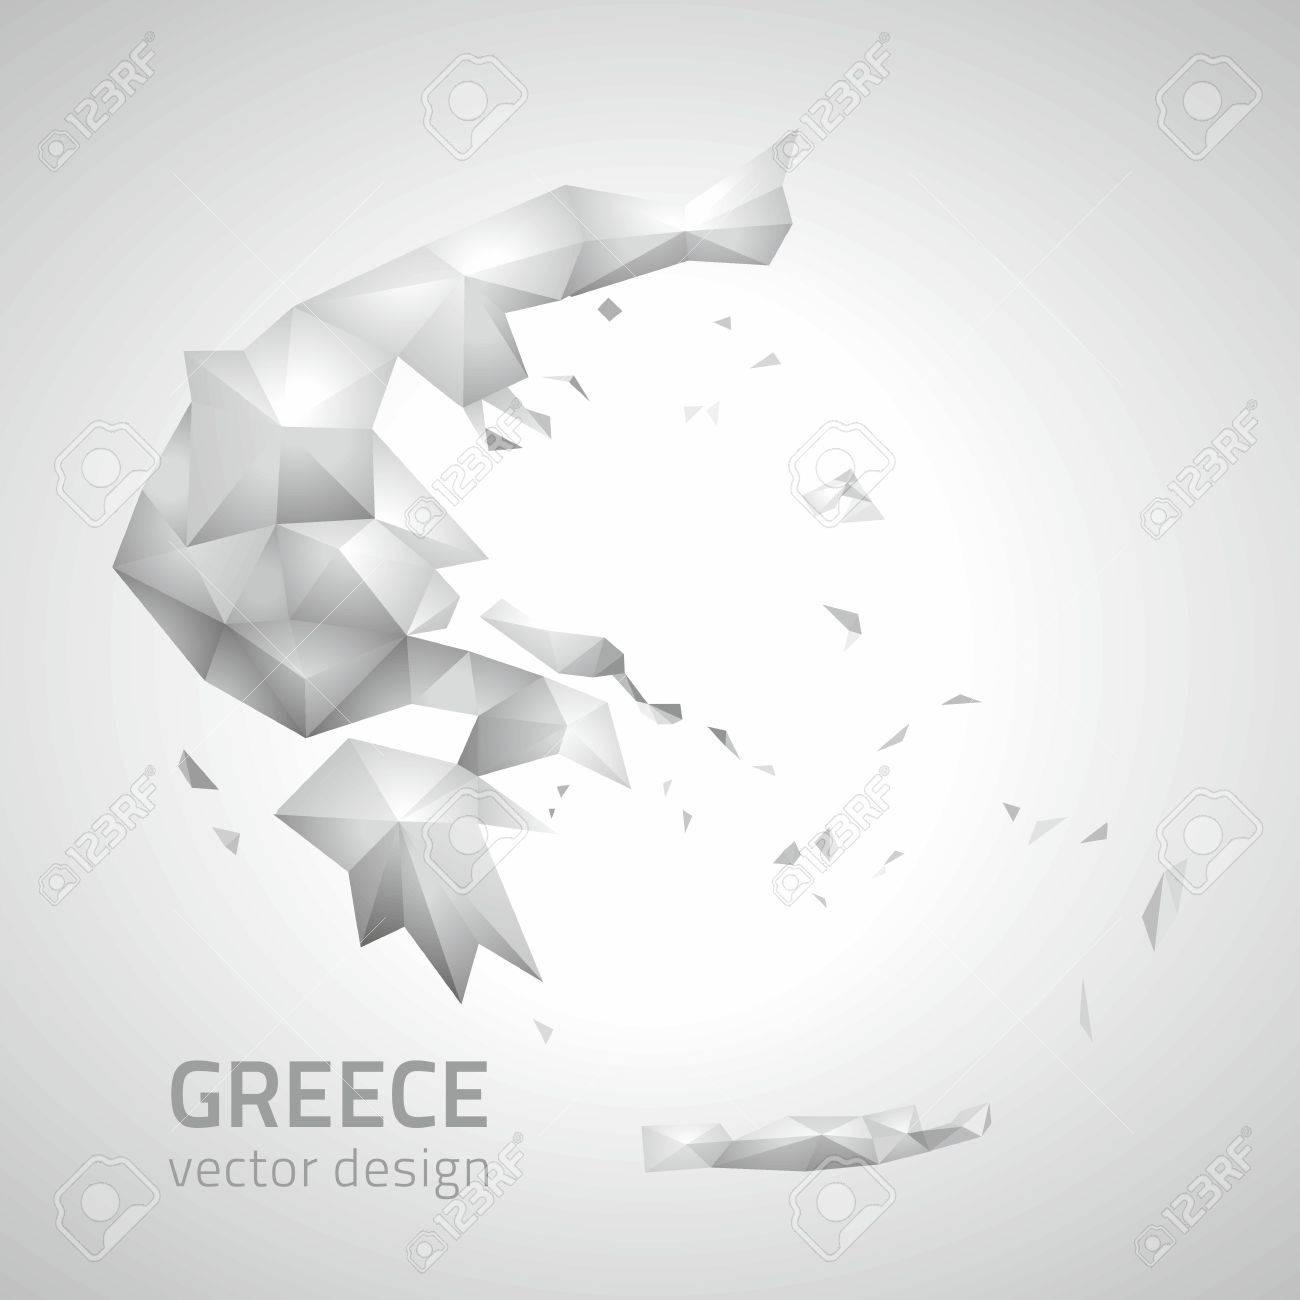 Greece vector polygonal modern map of Europe